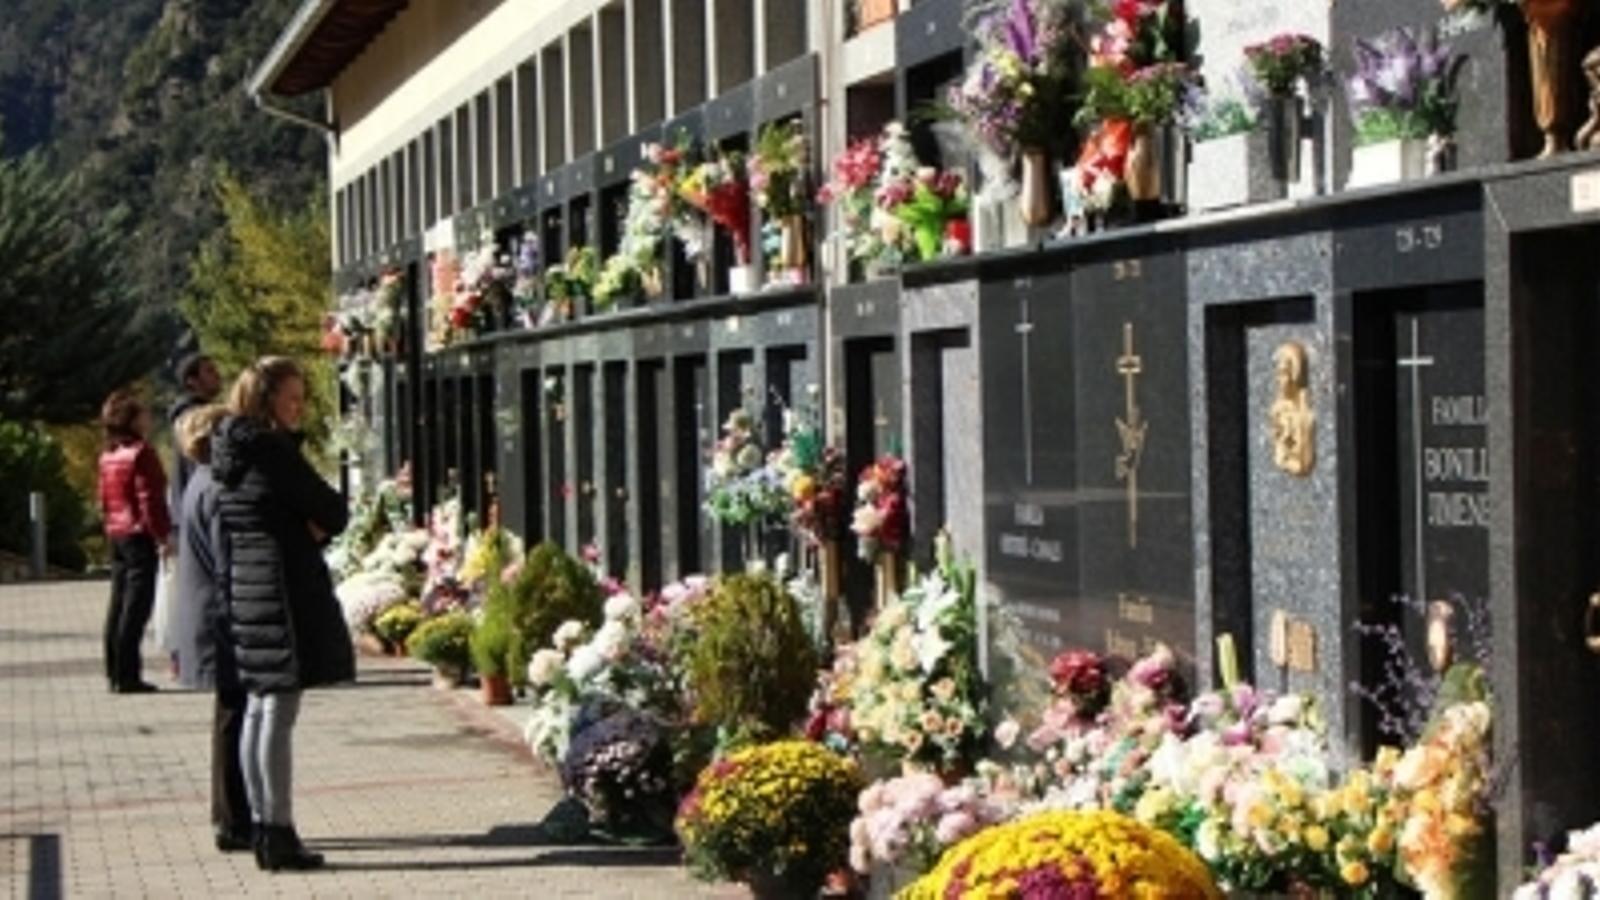 El cementiri d'Andorra la Vella. / ARXIU ANA